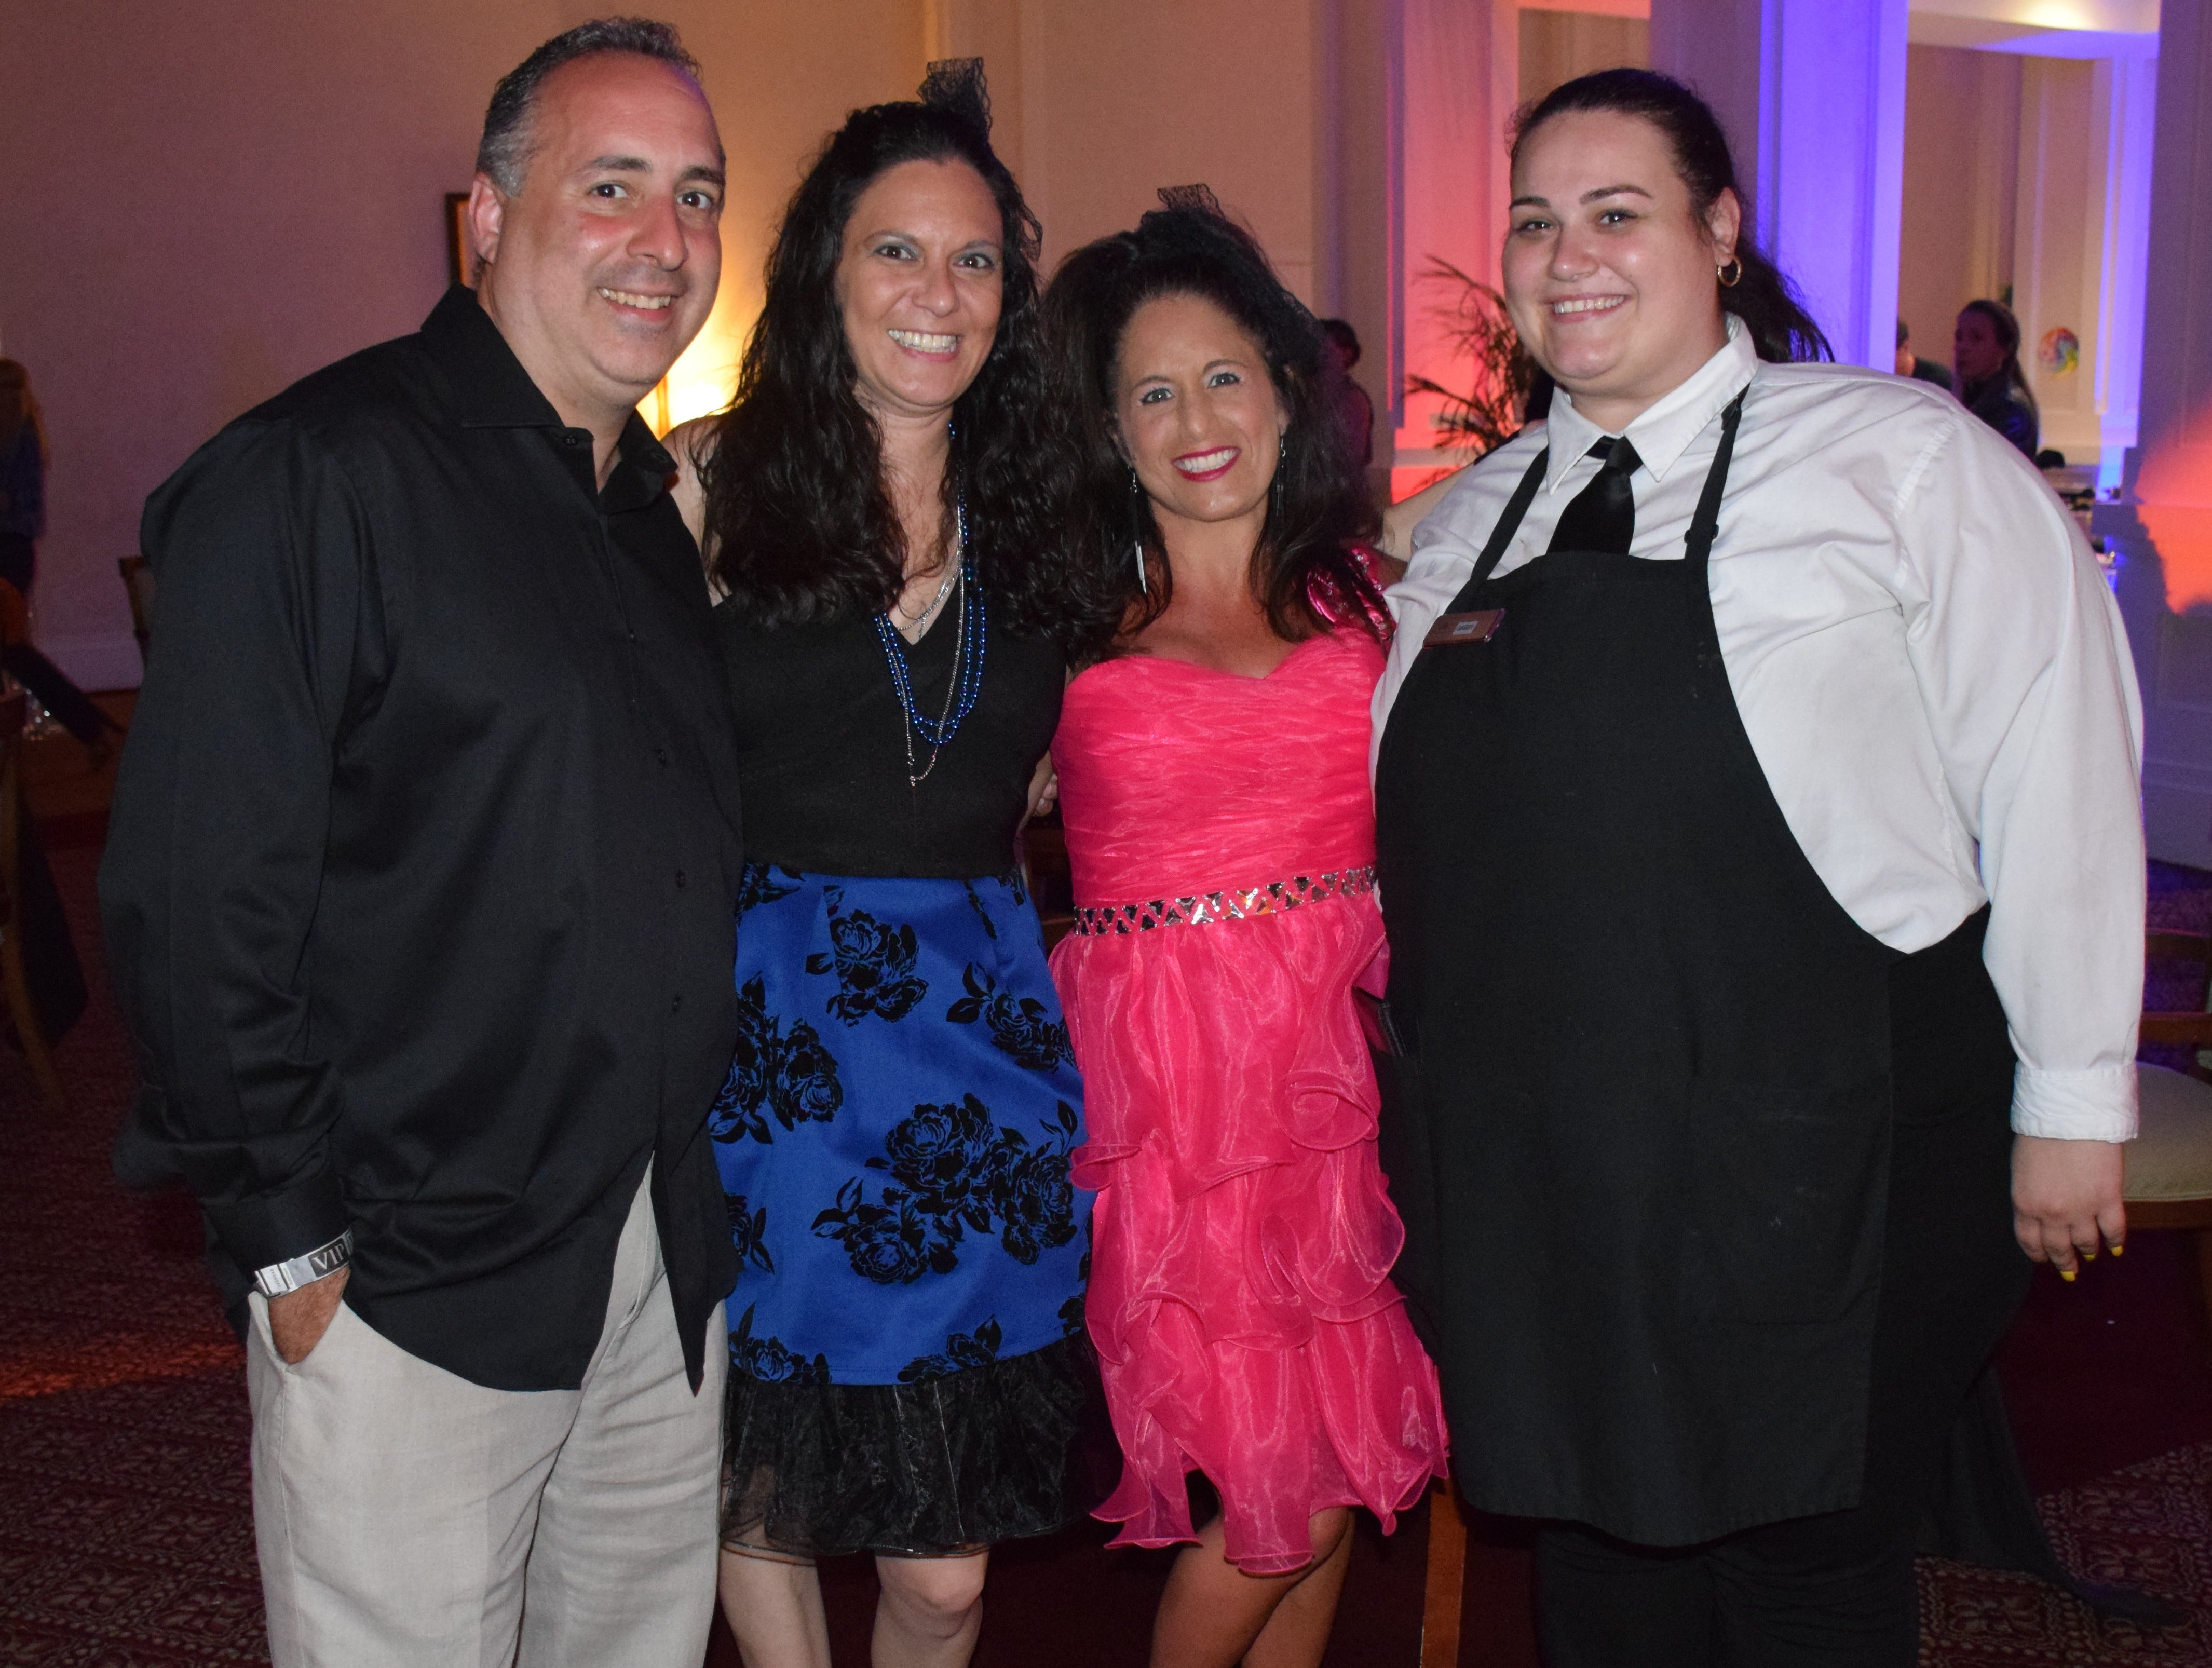 Sponsors John Reitano, Jeanine Abbey, Gina Sebastian and Oak Harbor staff member Gabby Raglievich